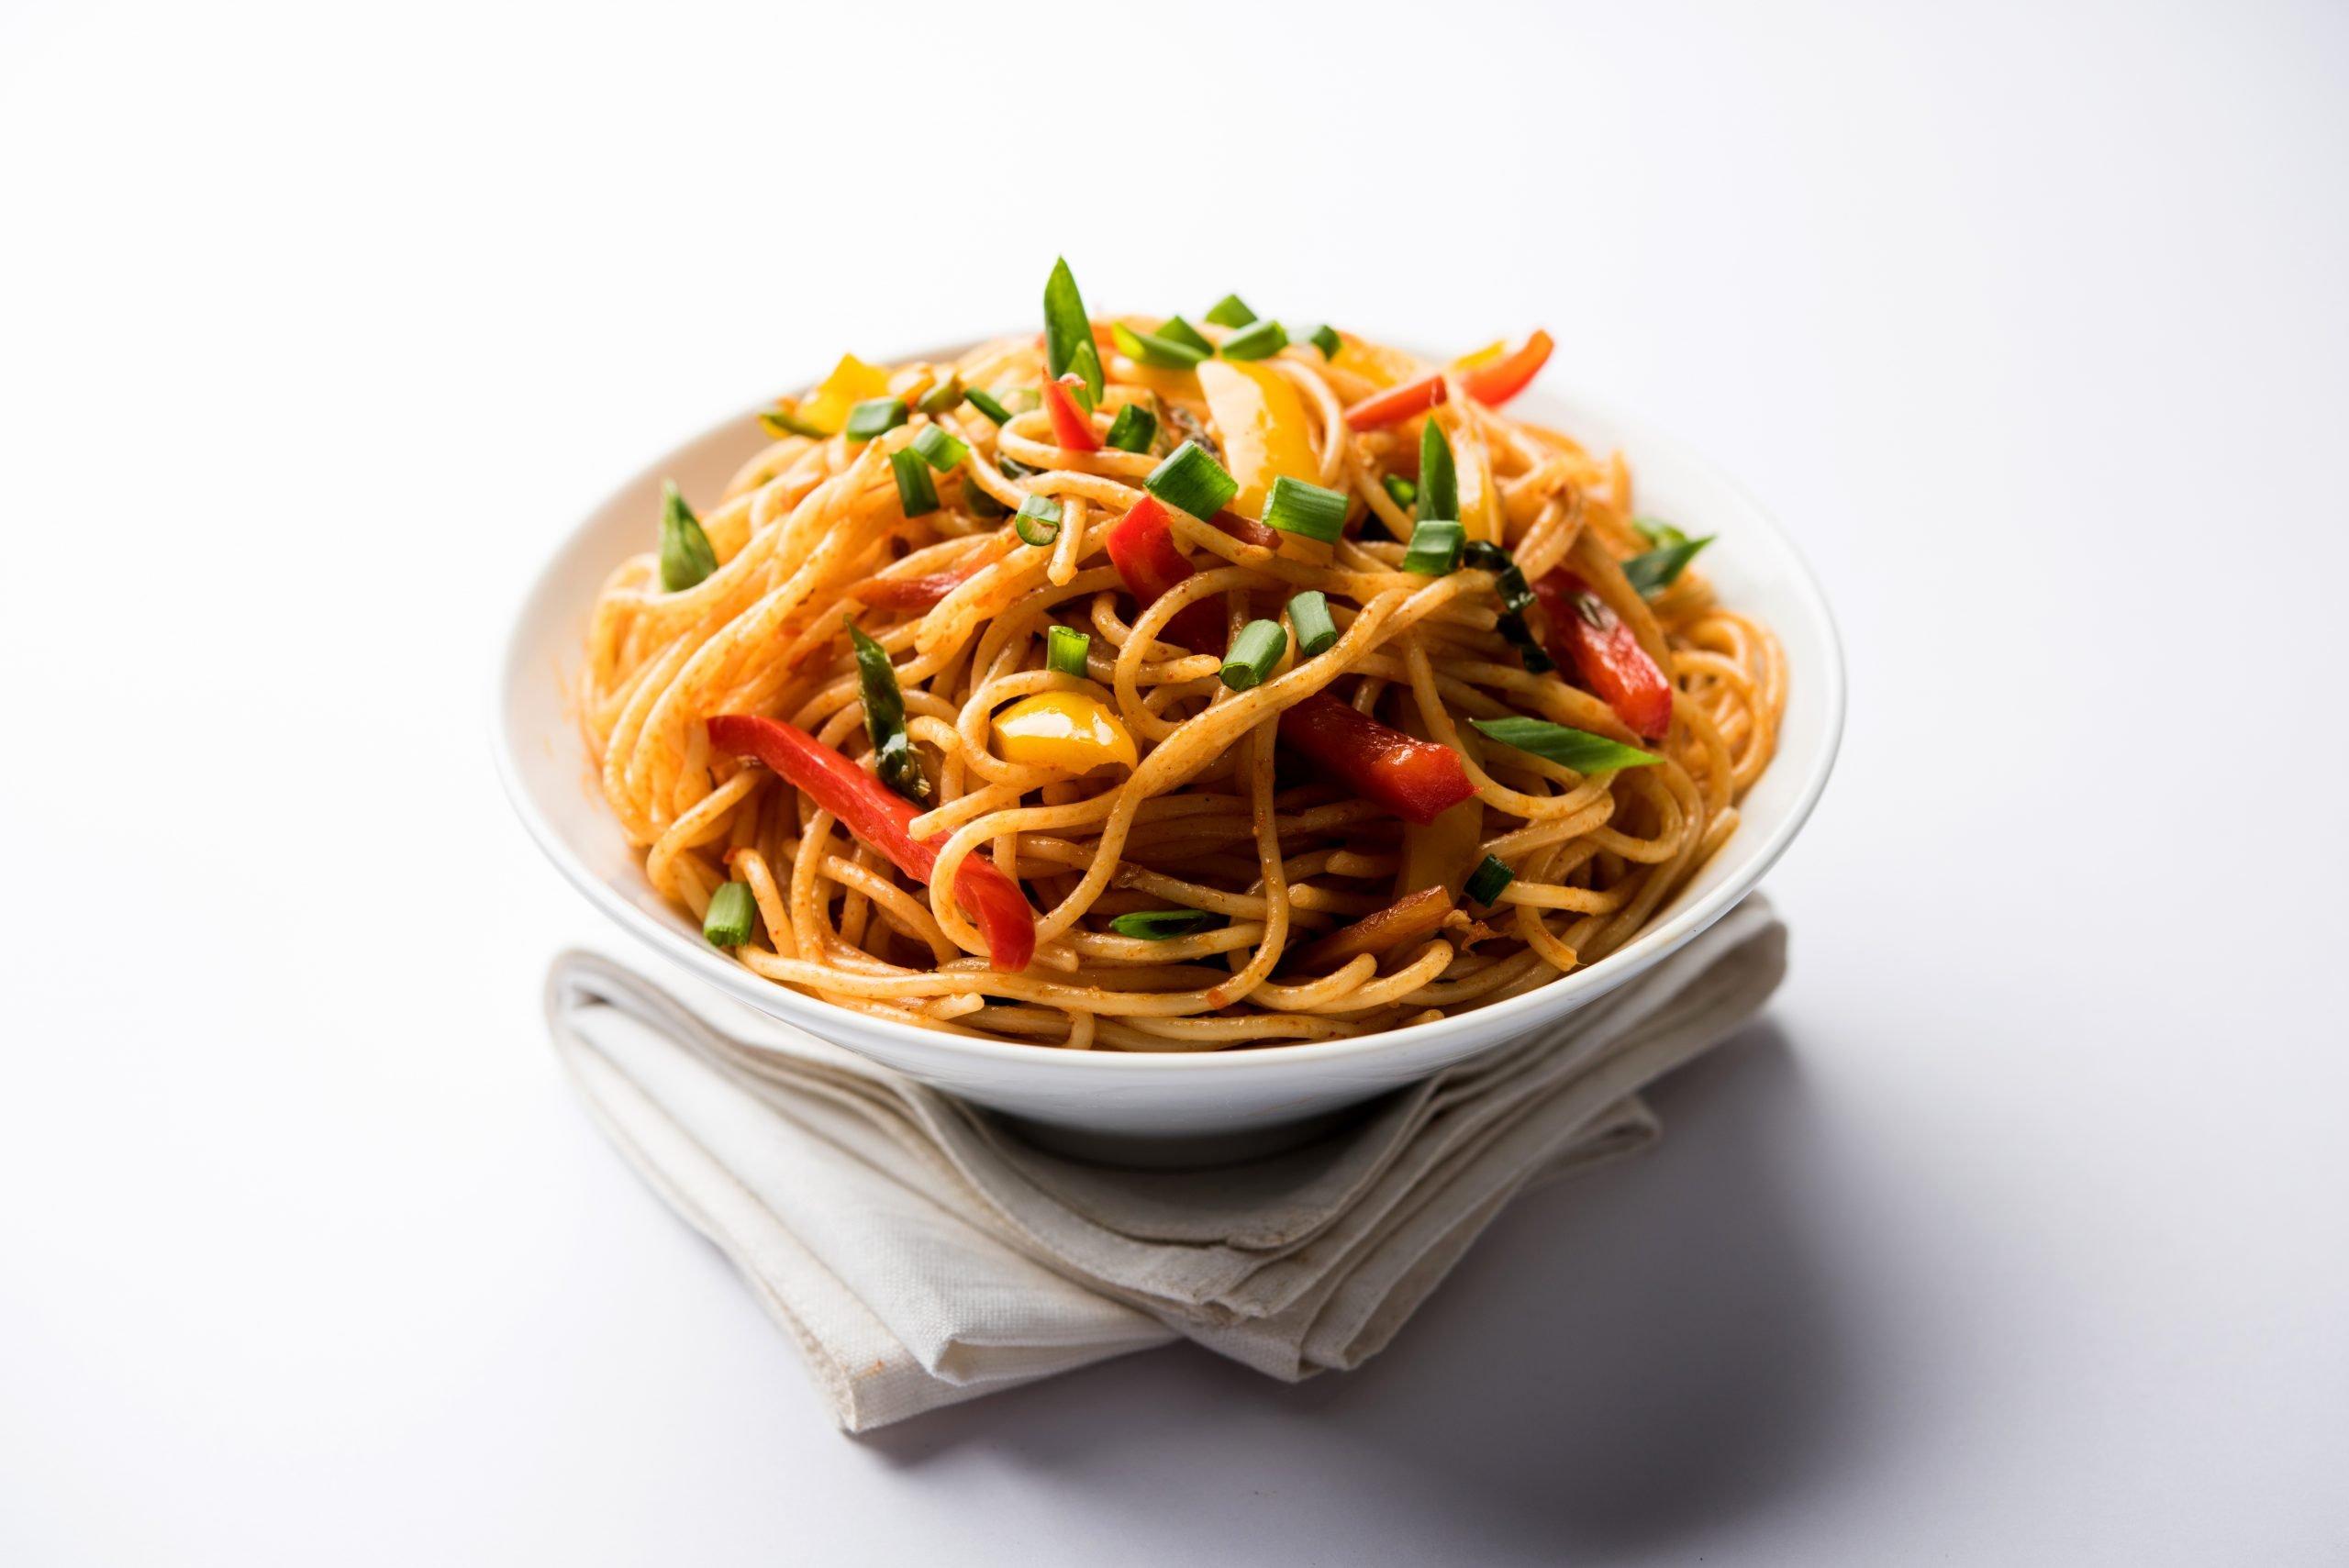 Schezwan Noodles - Bombay Chili